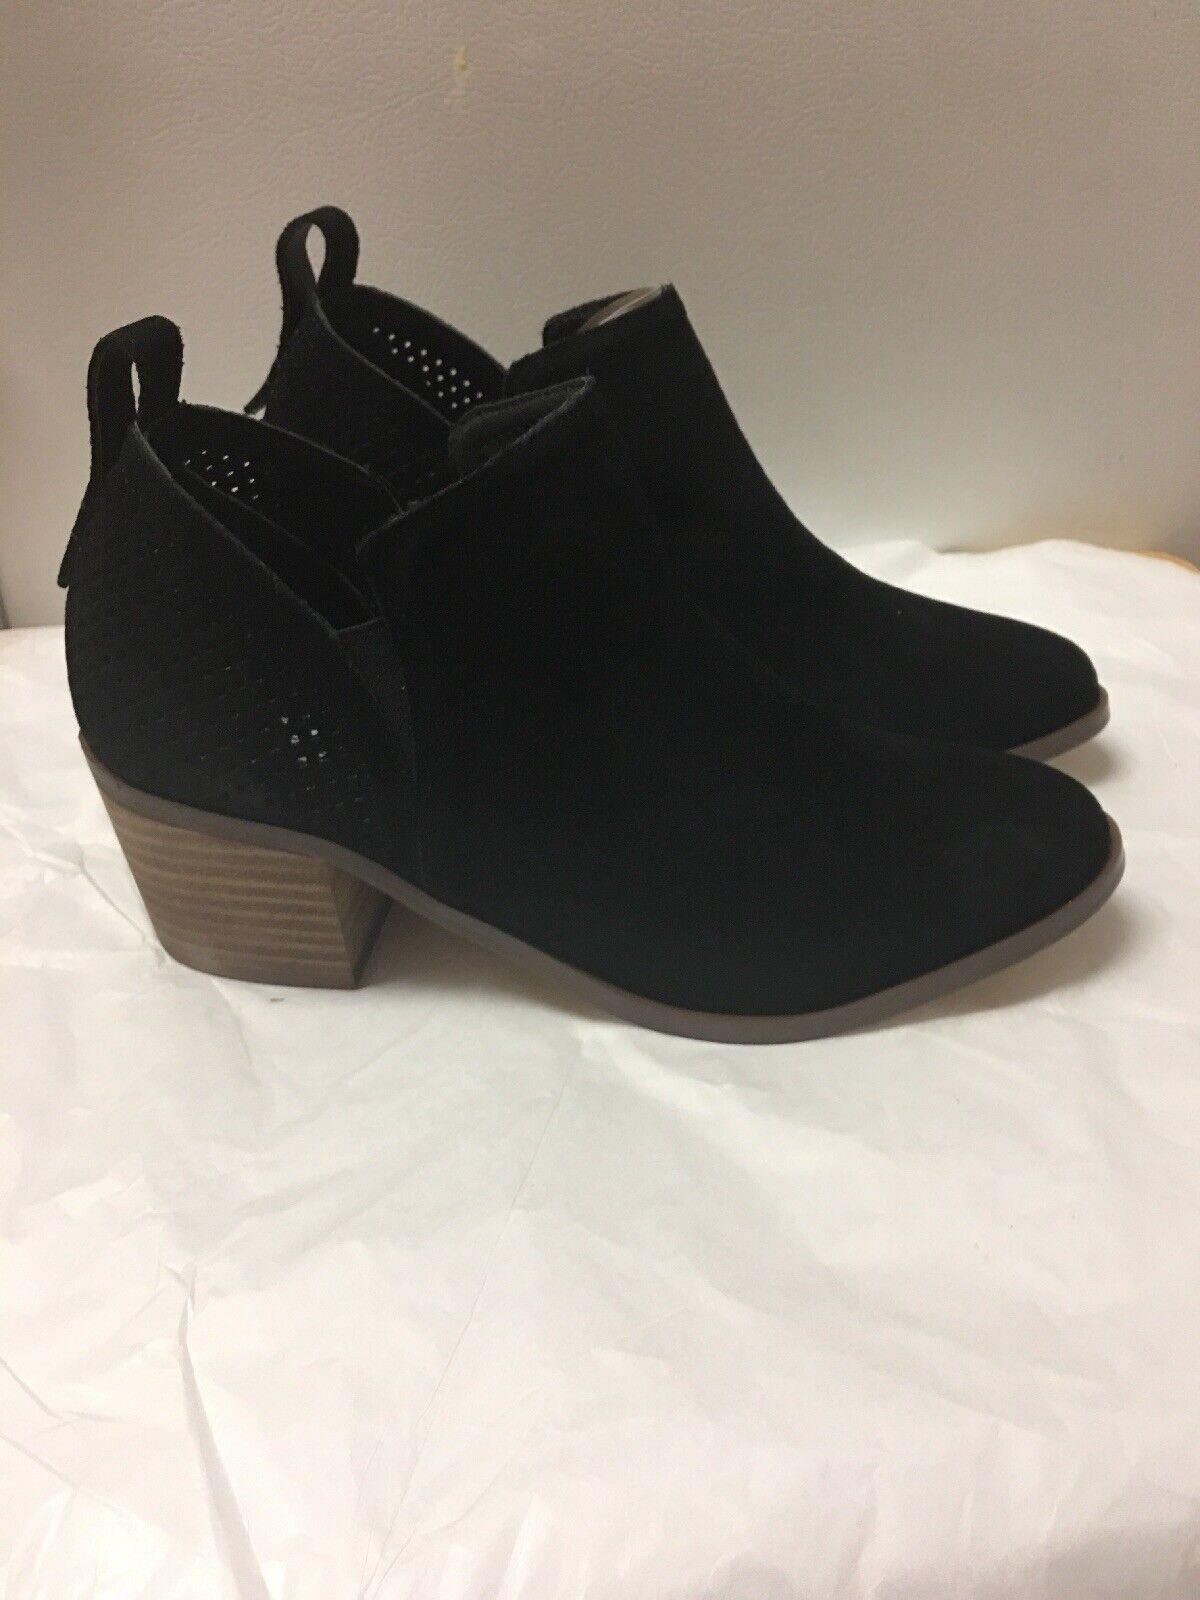 Steve Madden Negro de cuero de gamuza ruebey botines botas